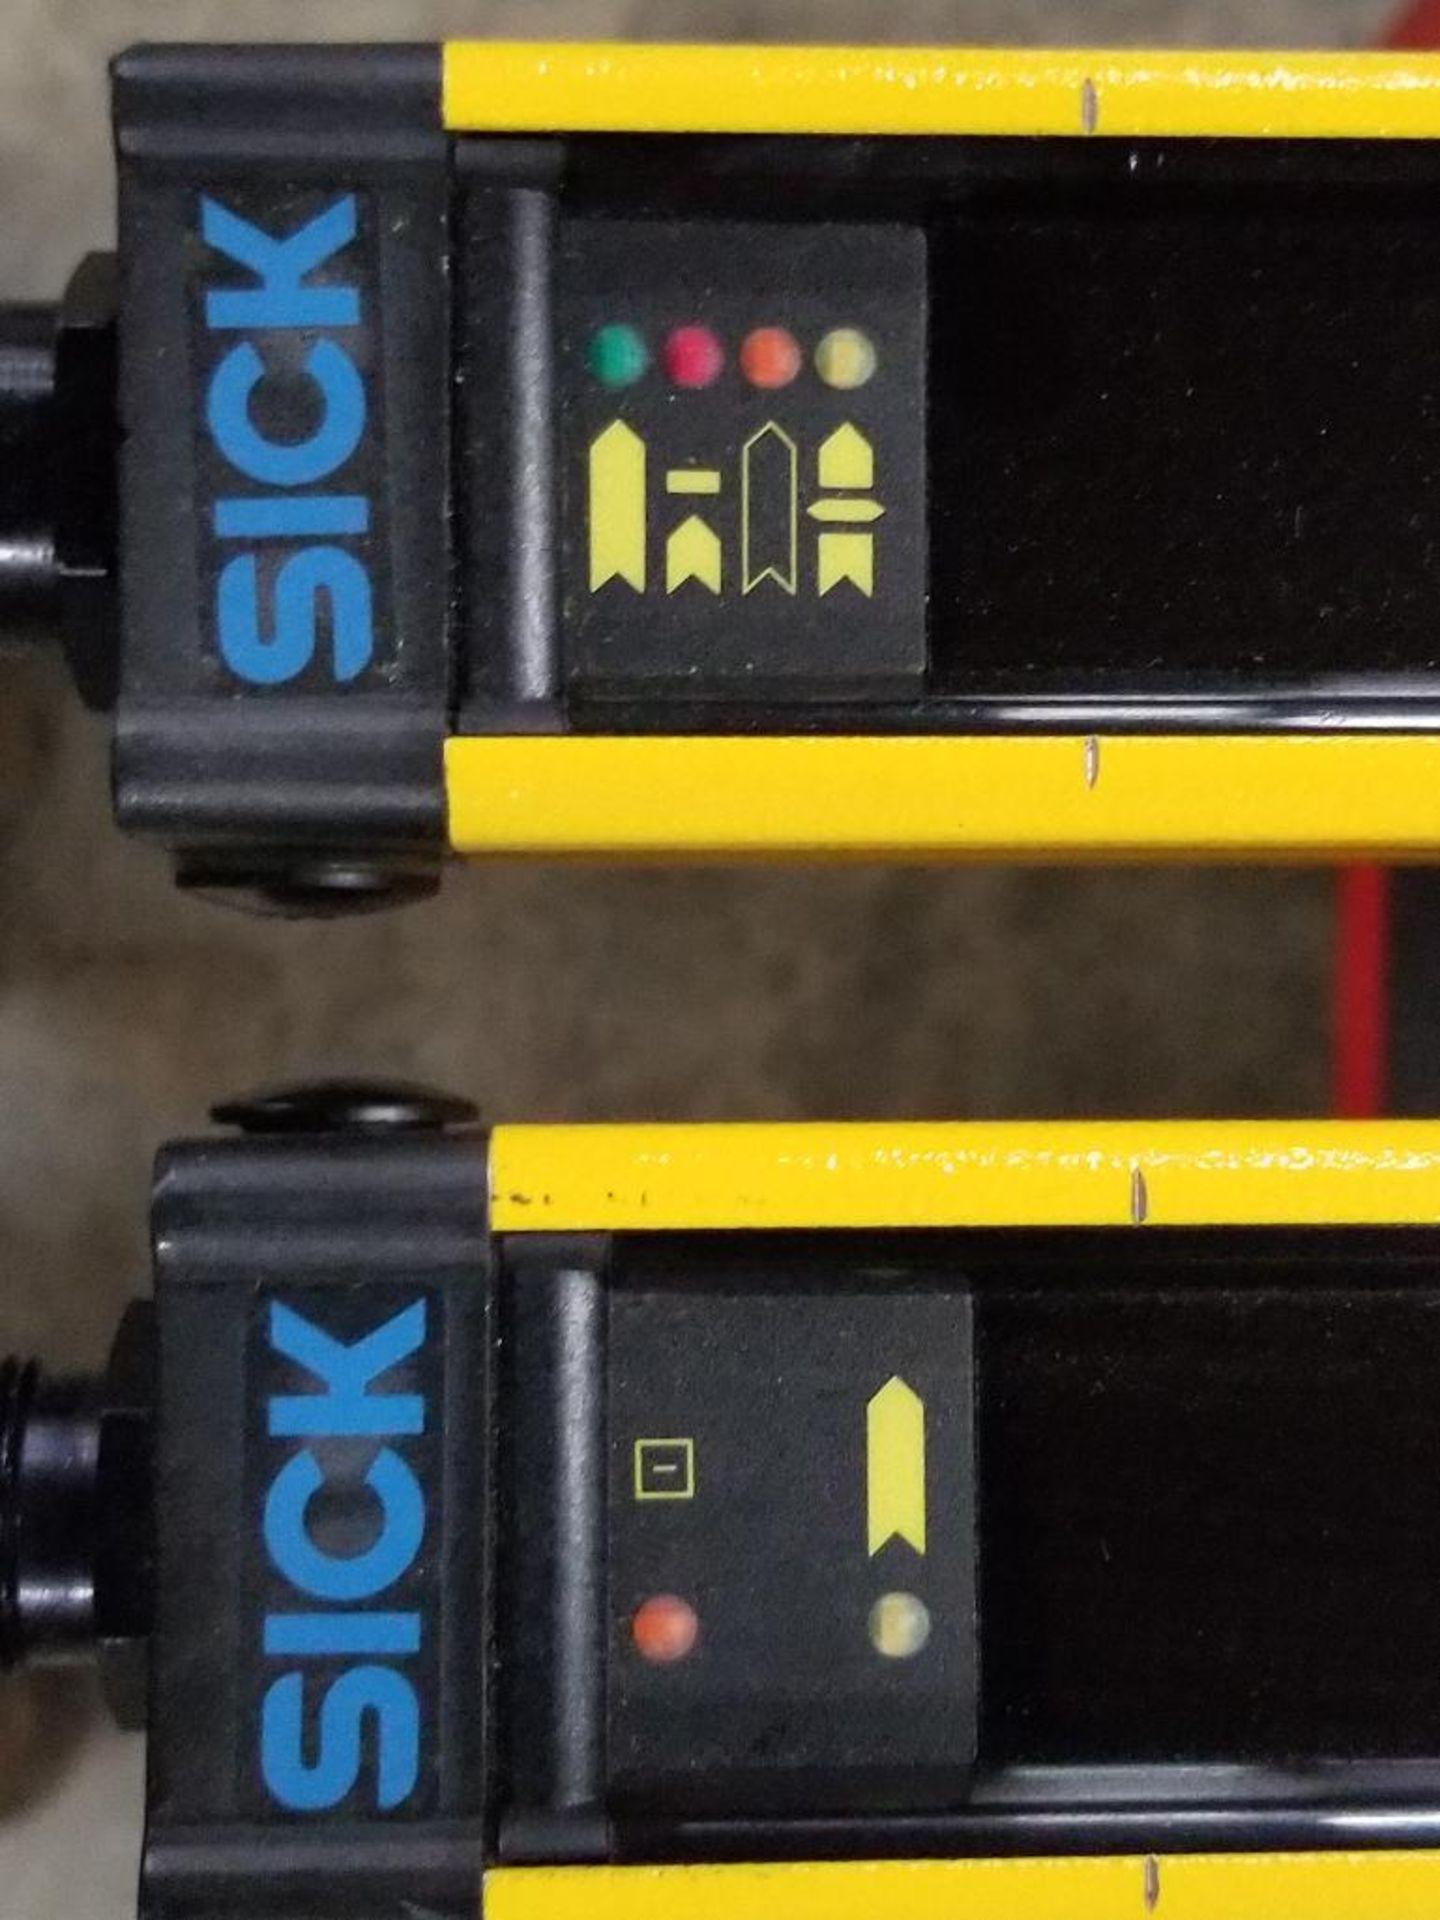 SICK Light curtain transmitter / receiver set. 14-FGS 1-012-767, 1-012-768. - Image 2 of 10